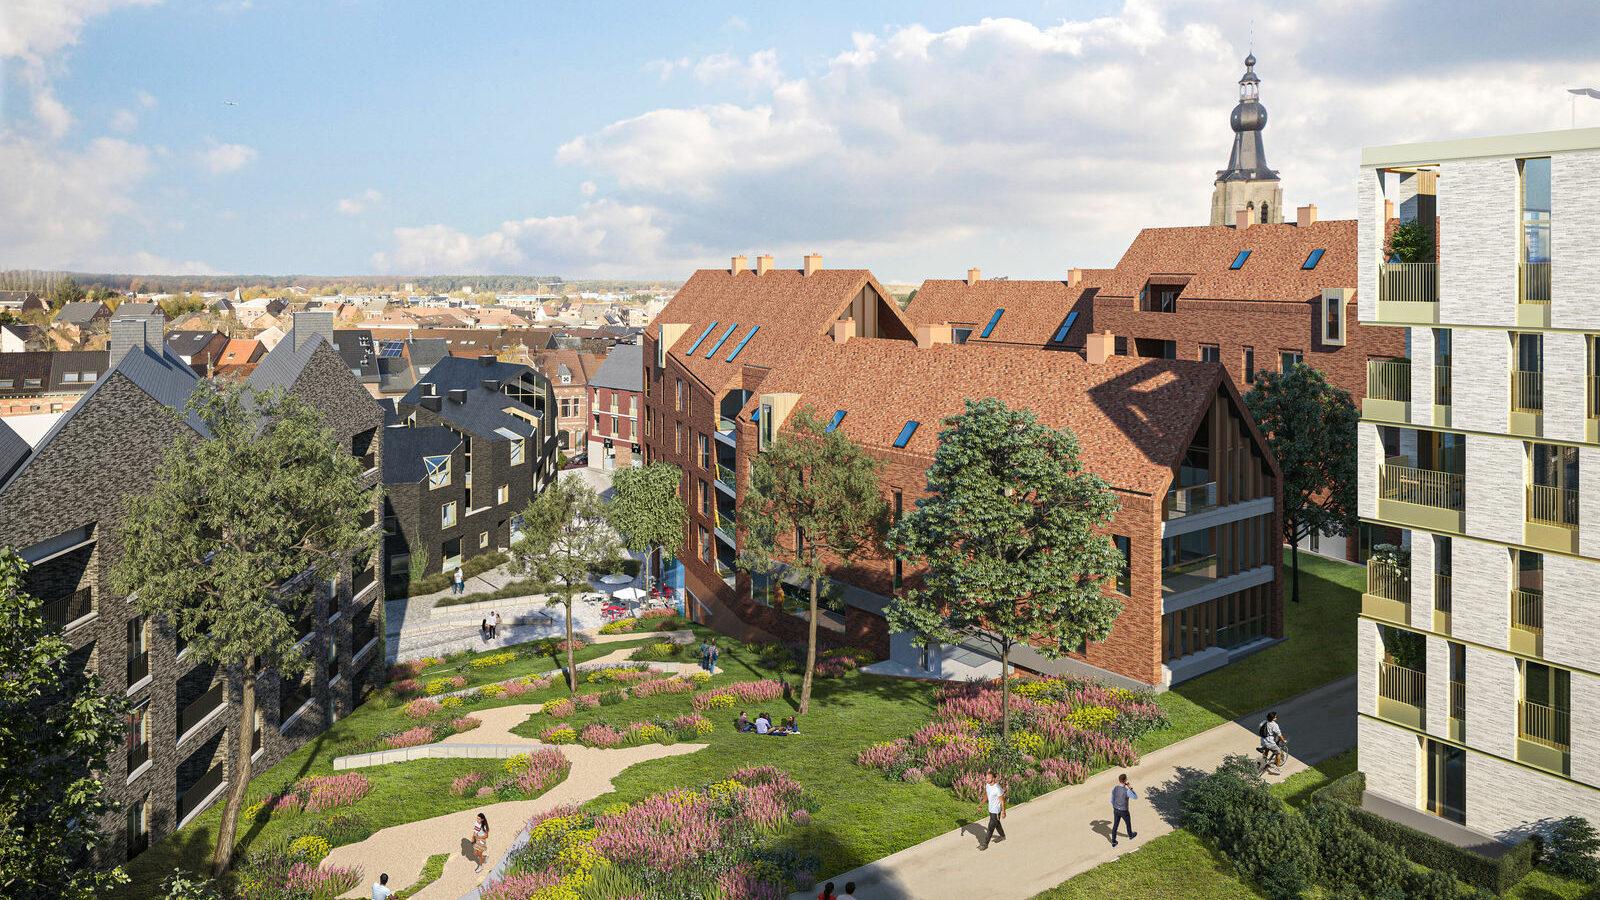 Woonproject De Torens, duiding van de architect.